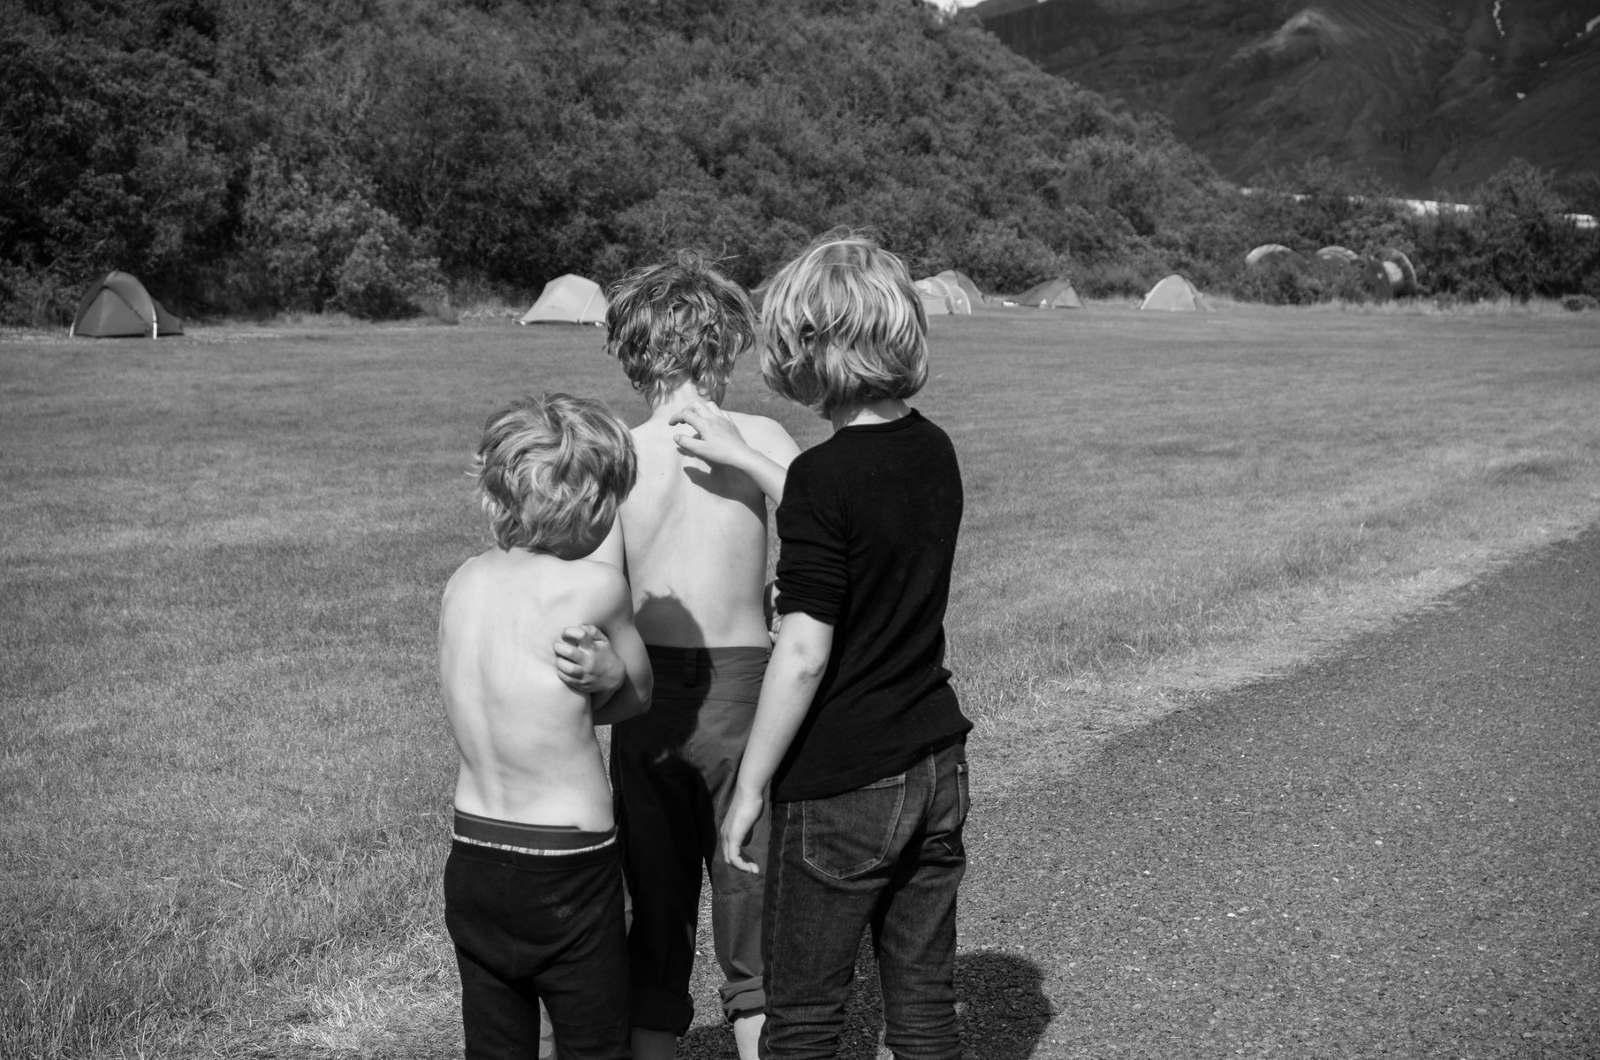 Matt Takaichi Group Study A Willingness To Get Close To Someone 2.jpg